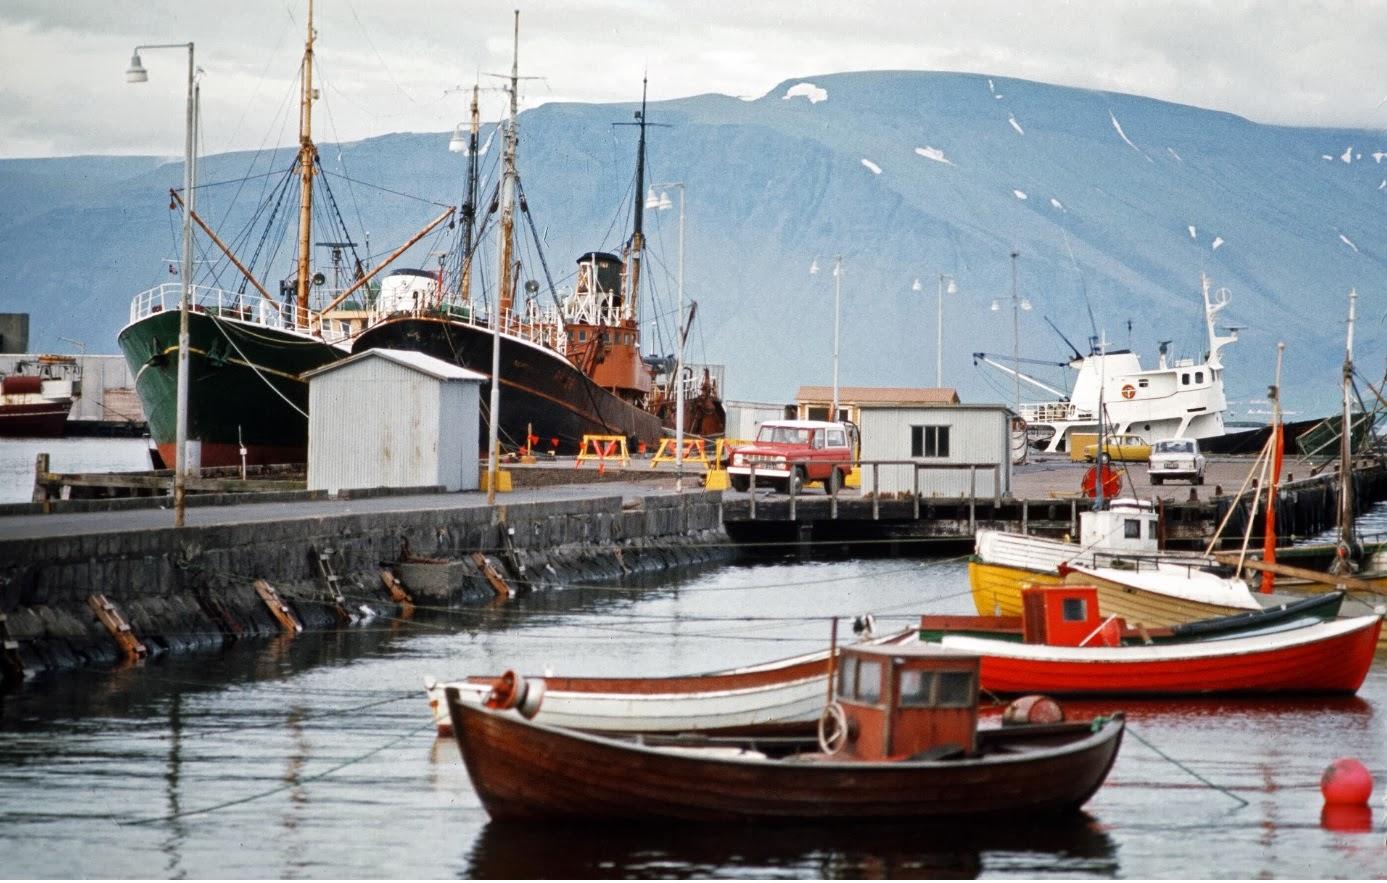 Iceland 7 - Harbor